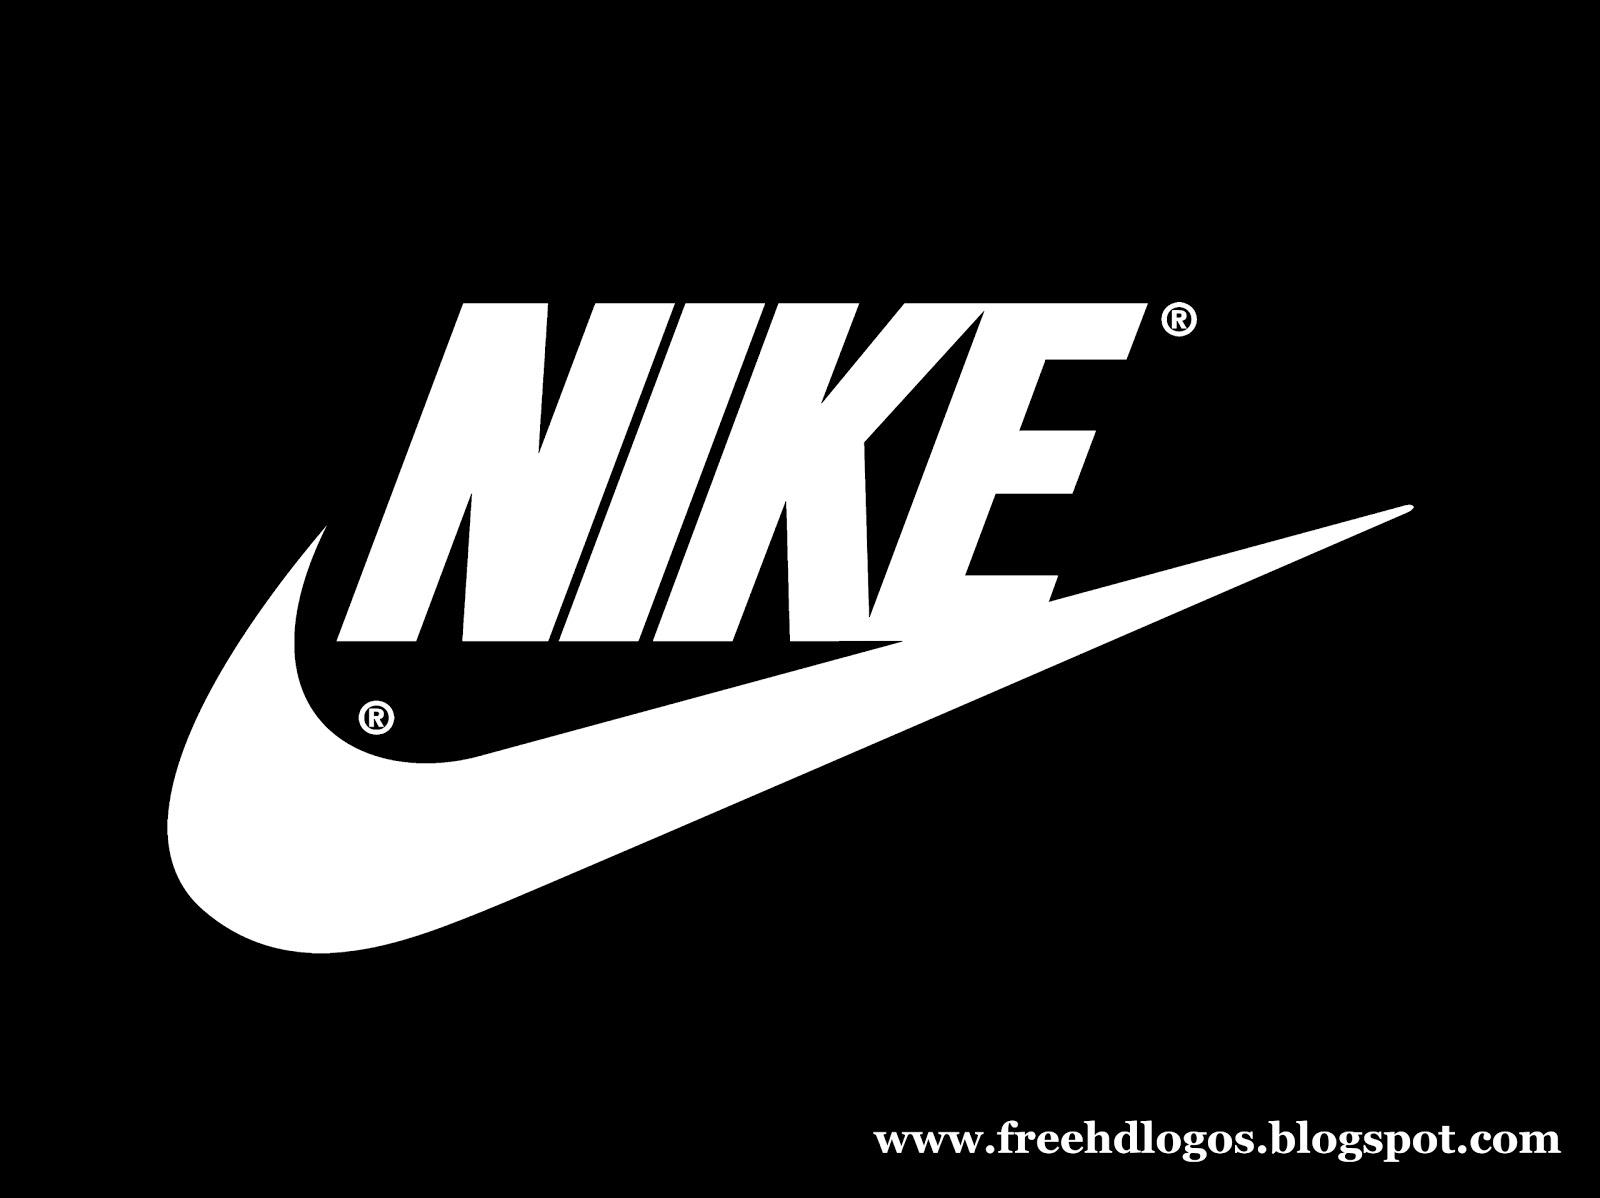 http://1.bp.blogspot.com/-EMBOhWna8-w/T4GcM6tKbtI/AAAAAAAAAi0/3A2nRYAIp2M/s1600/Nike%2Blogo%2Bdark%2Bwith%2BNike%2Bname%2Bfreehdlogos.jpg